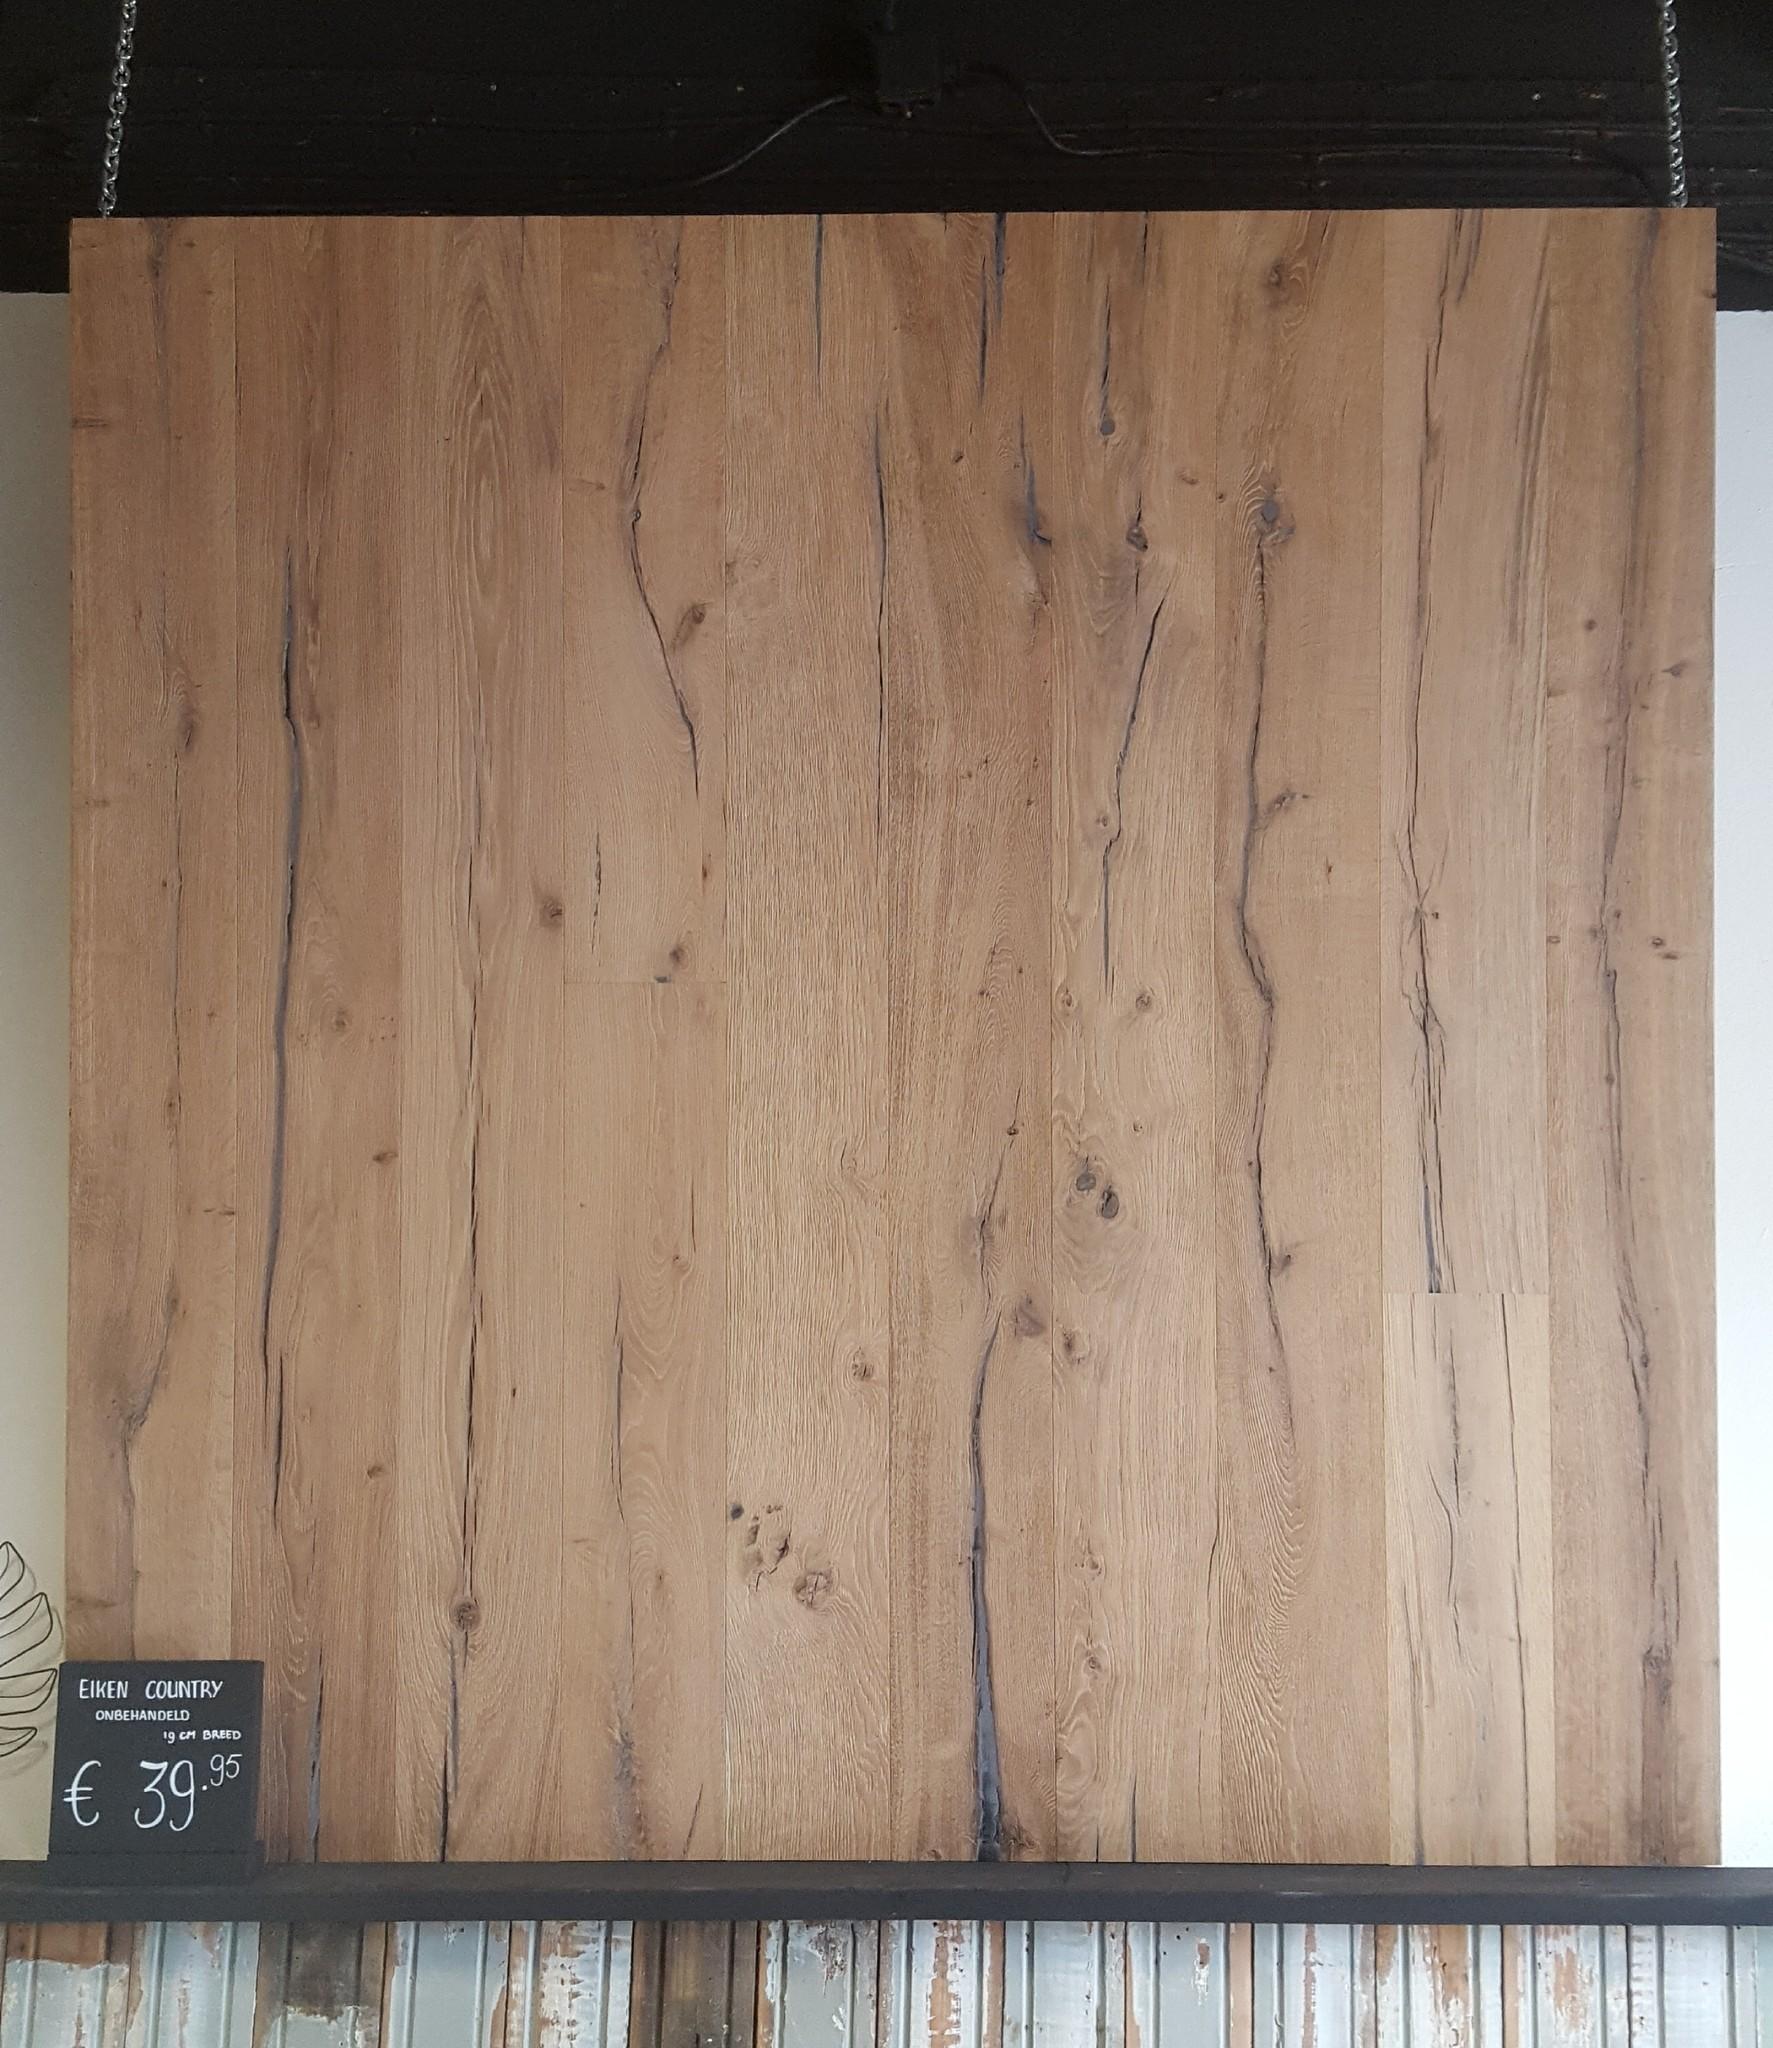 Eiken country houten vloer